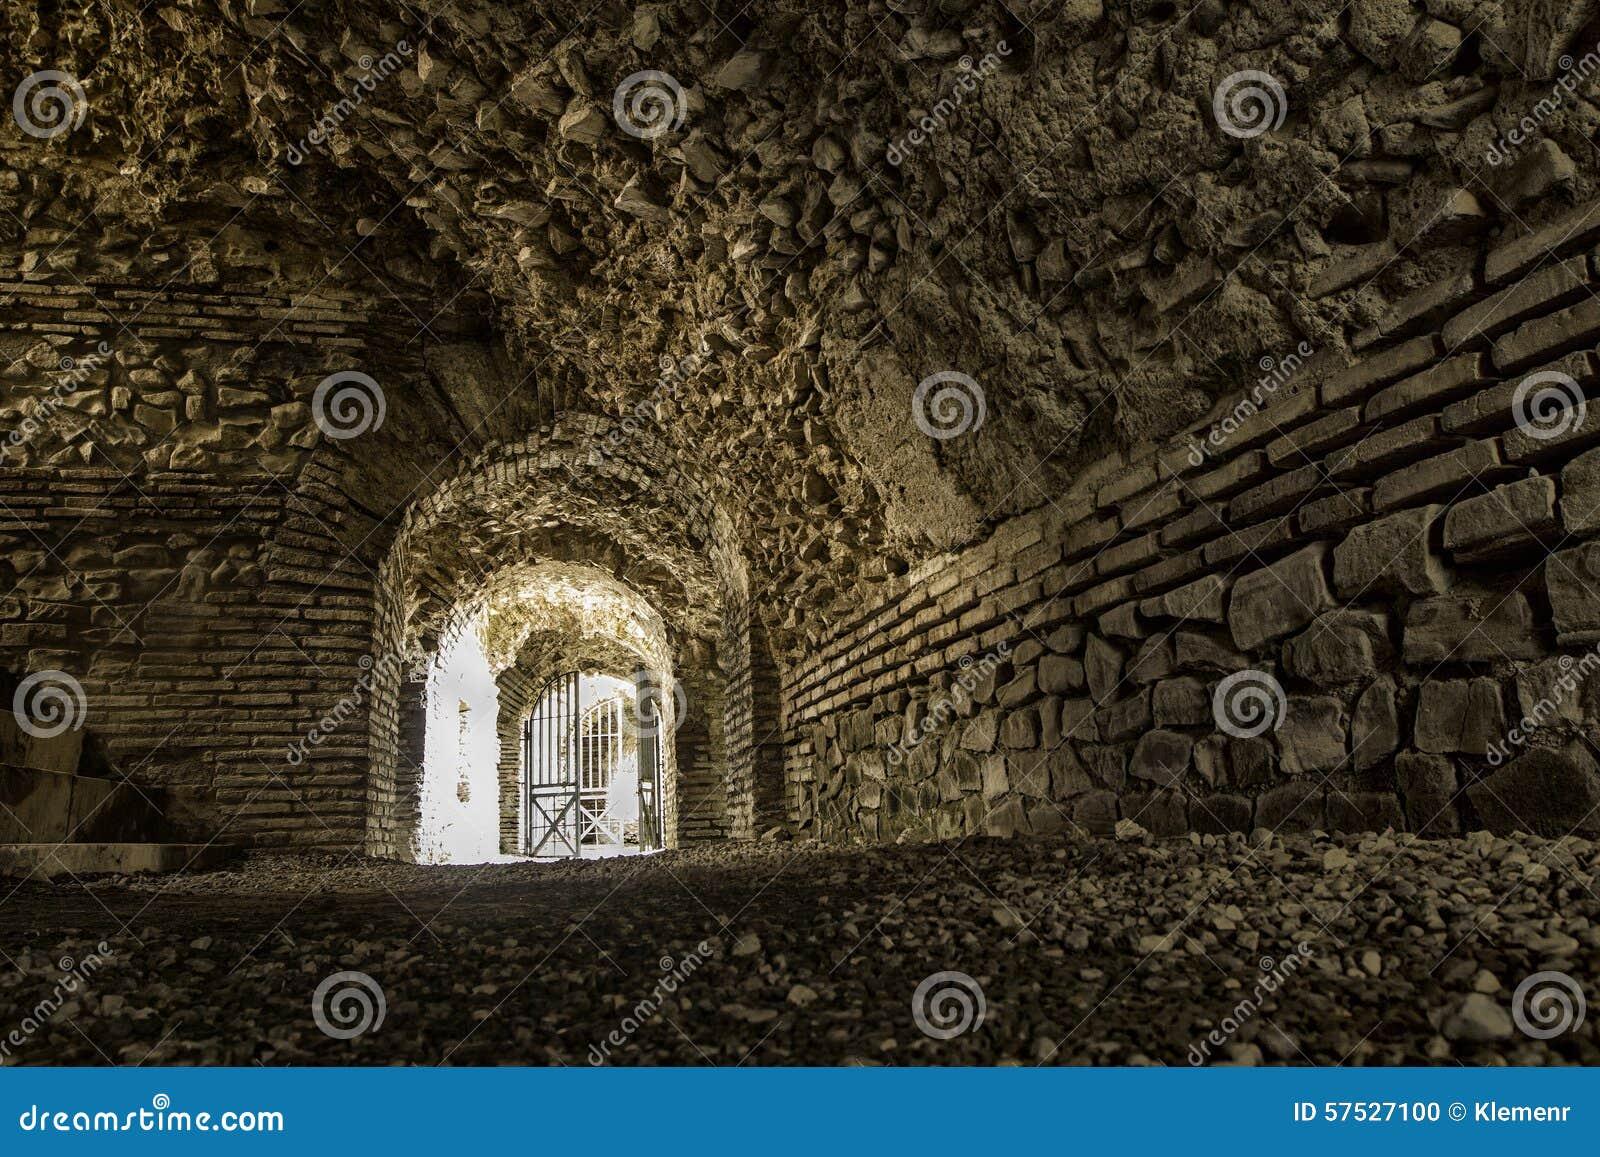 Under amphitheater in city of Duress